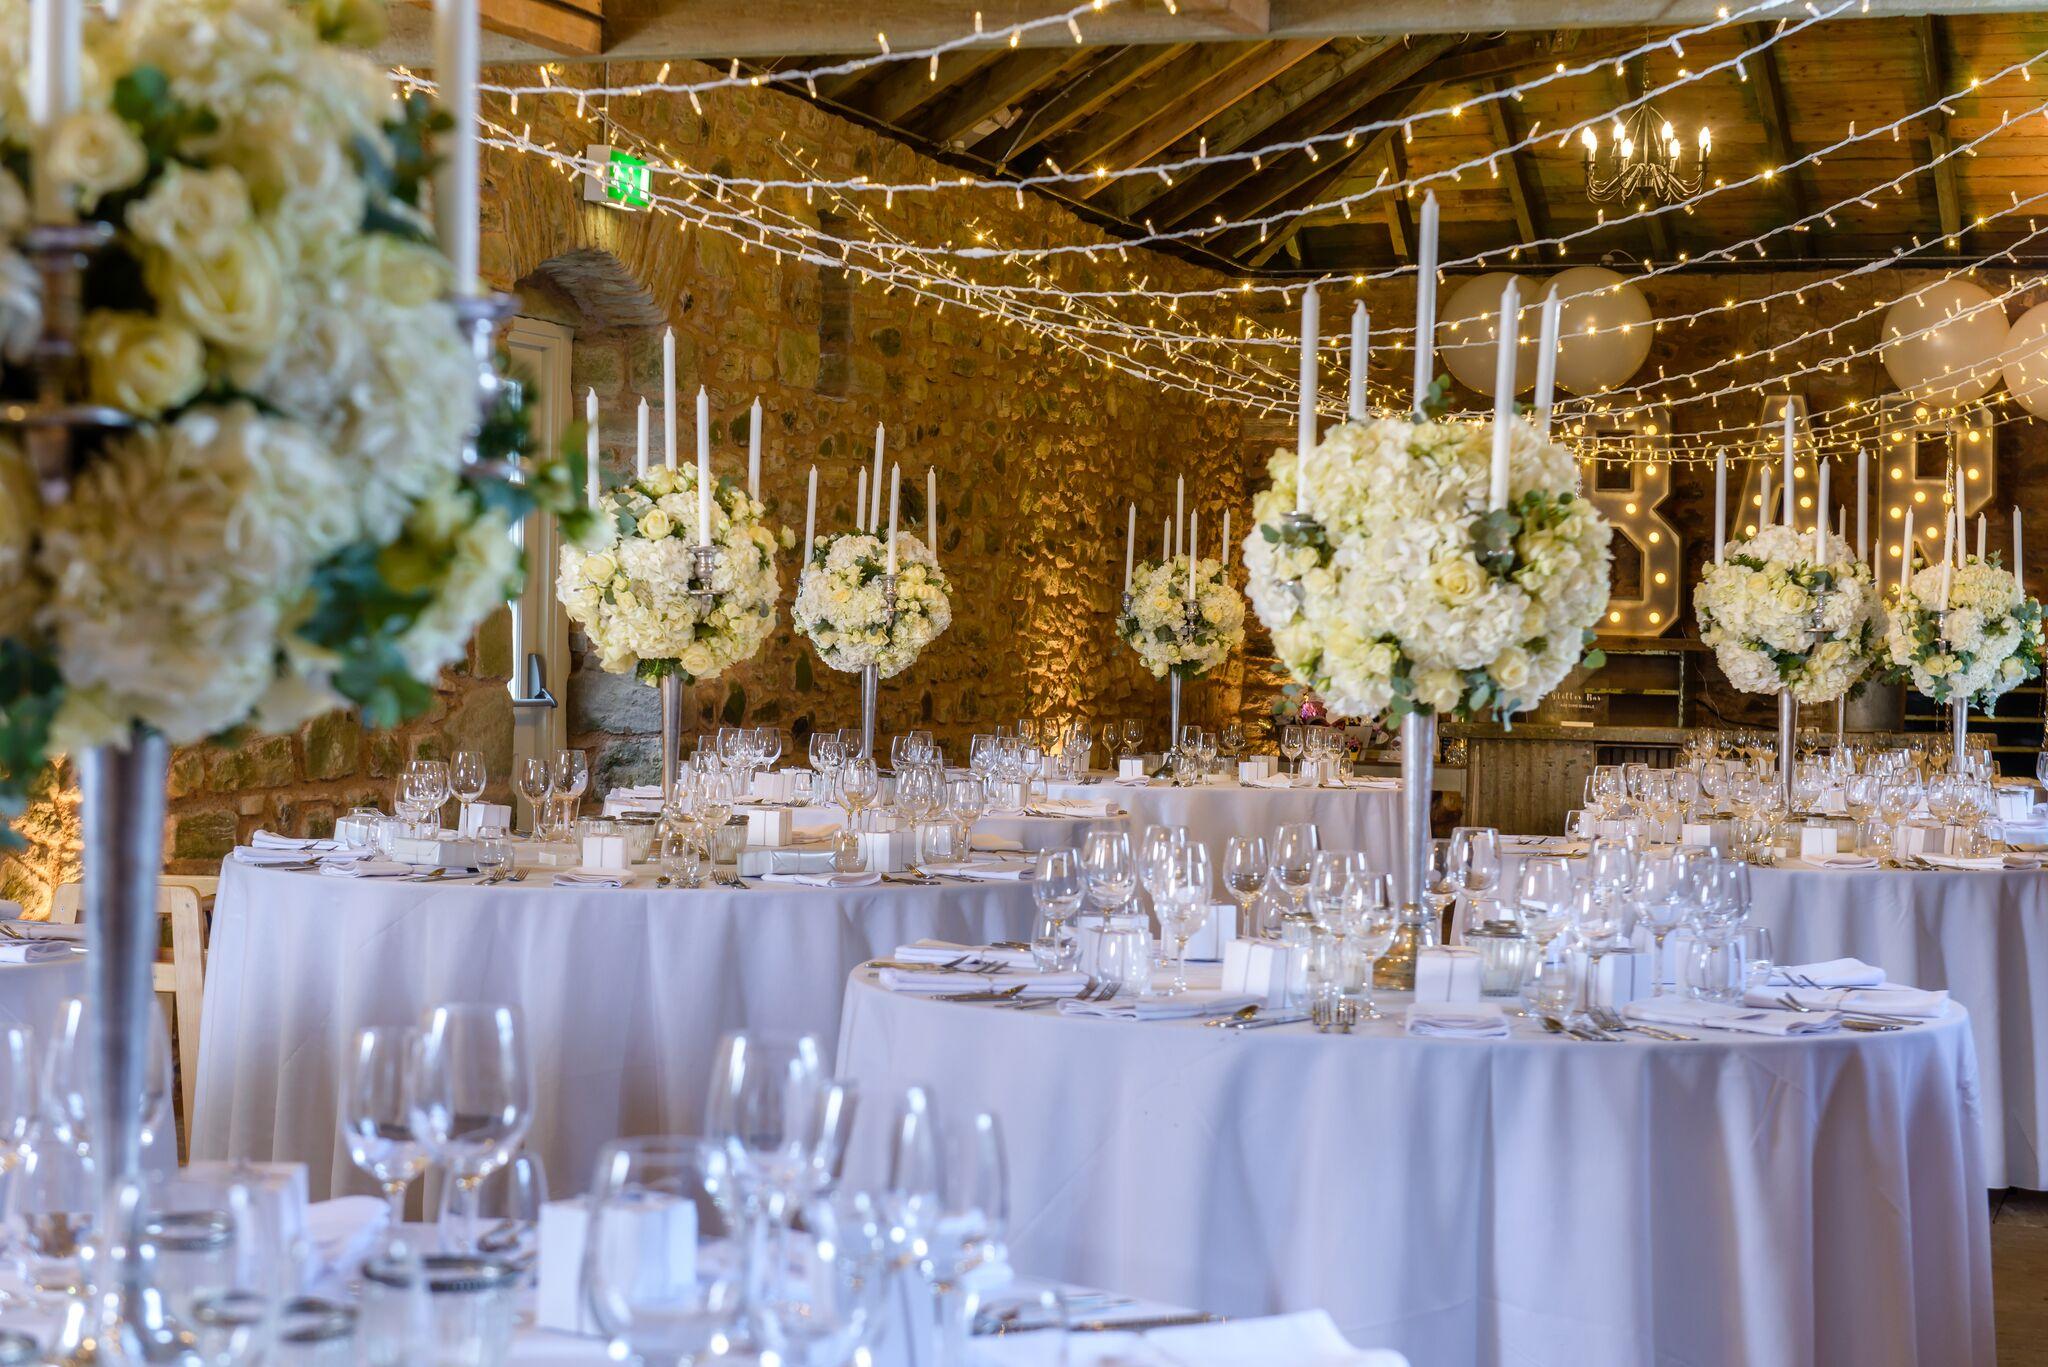 Get-Knotted.net Wedderburn Castle Barn wedding - Reception styling (image credit - kevingreenfield.com) (2)_preview